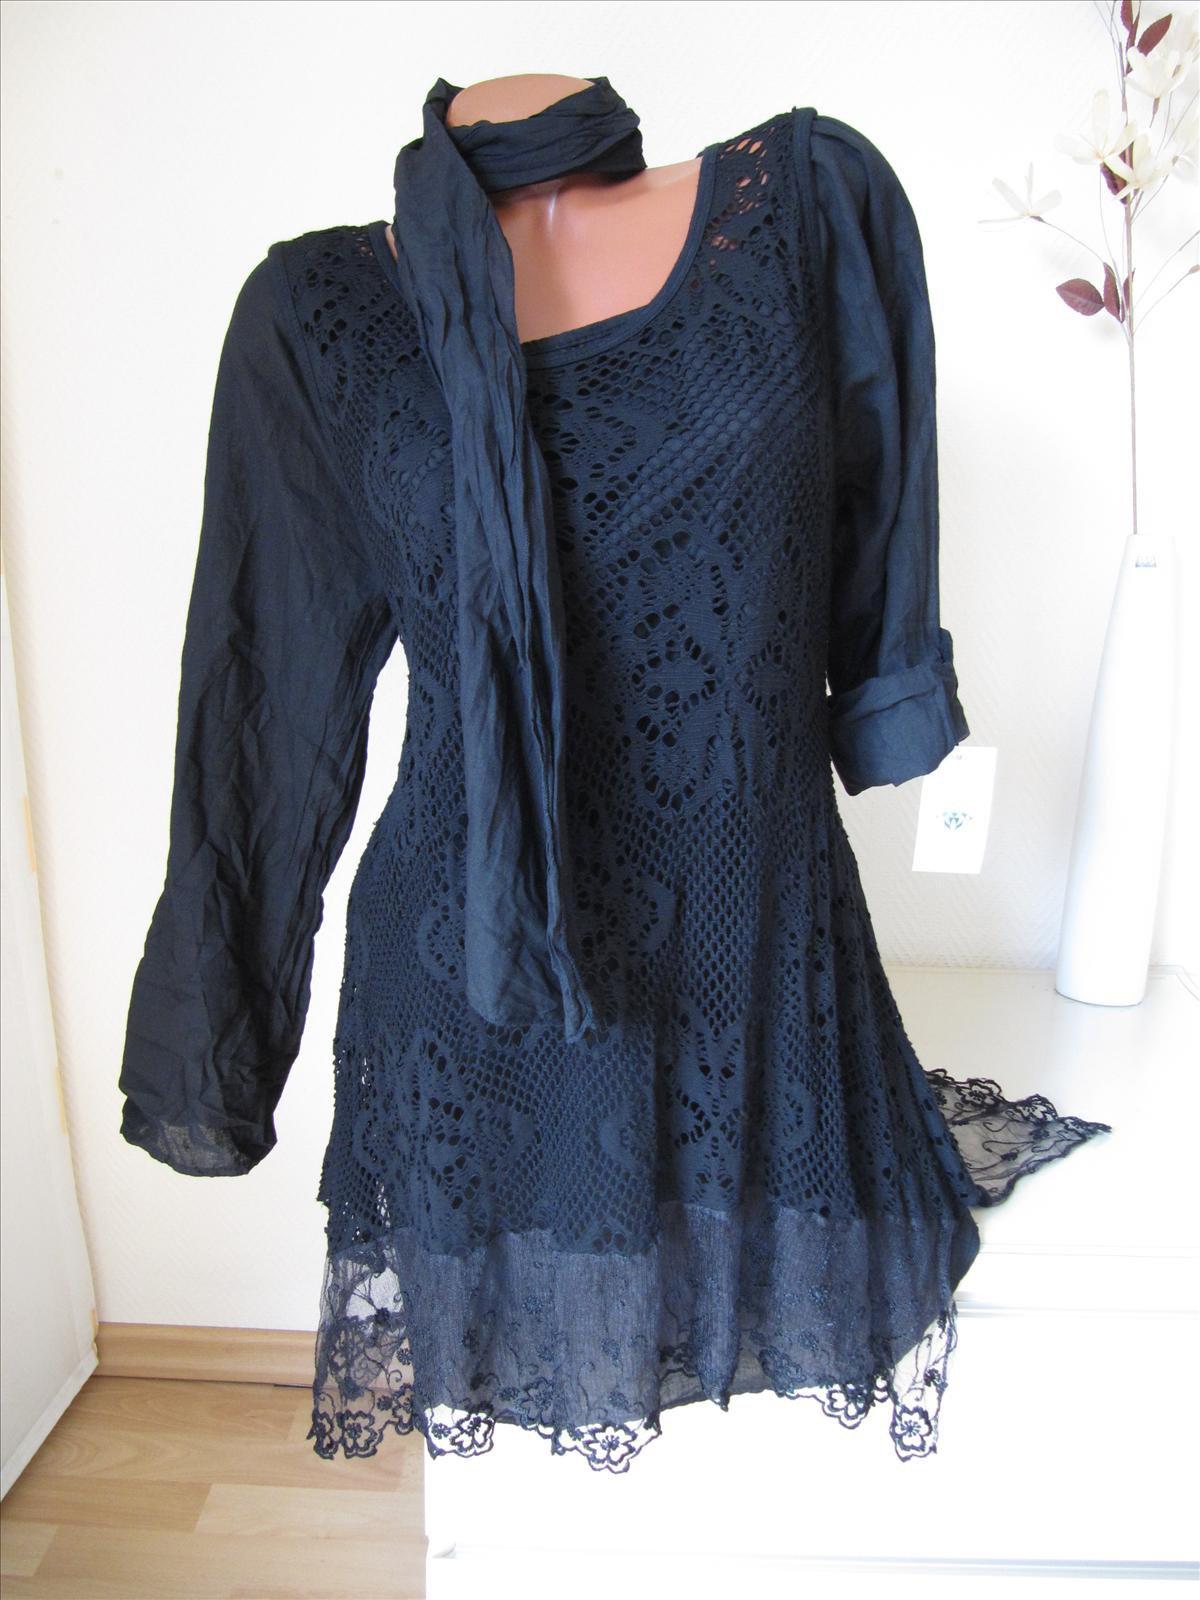 zipfel tunika kleid spitze volant unterkleid bluse schal. Black Bedroom Furniture Sets. Home Design Ideas